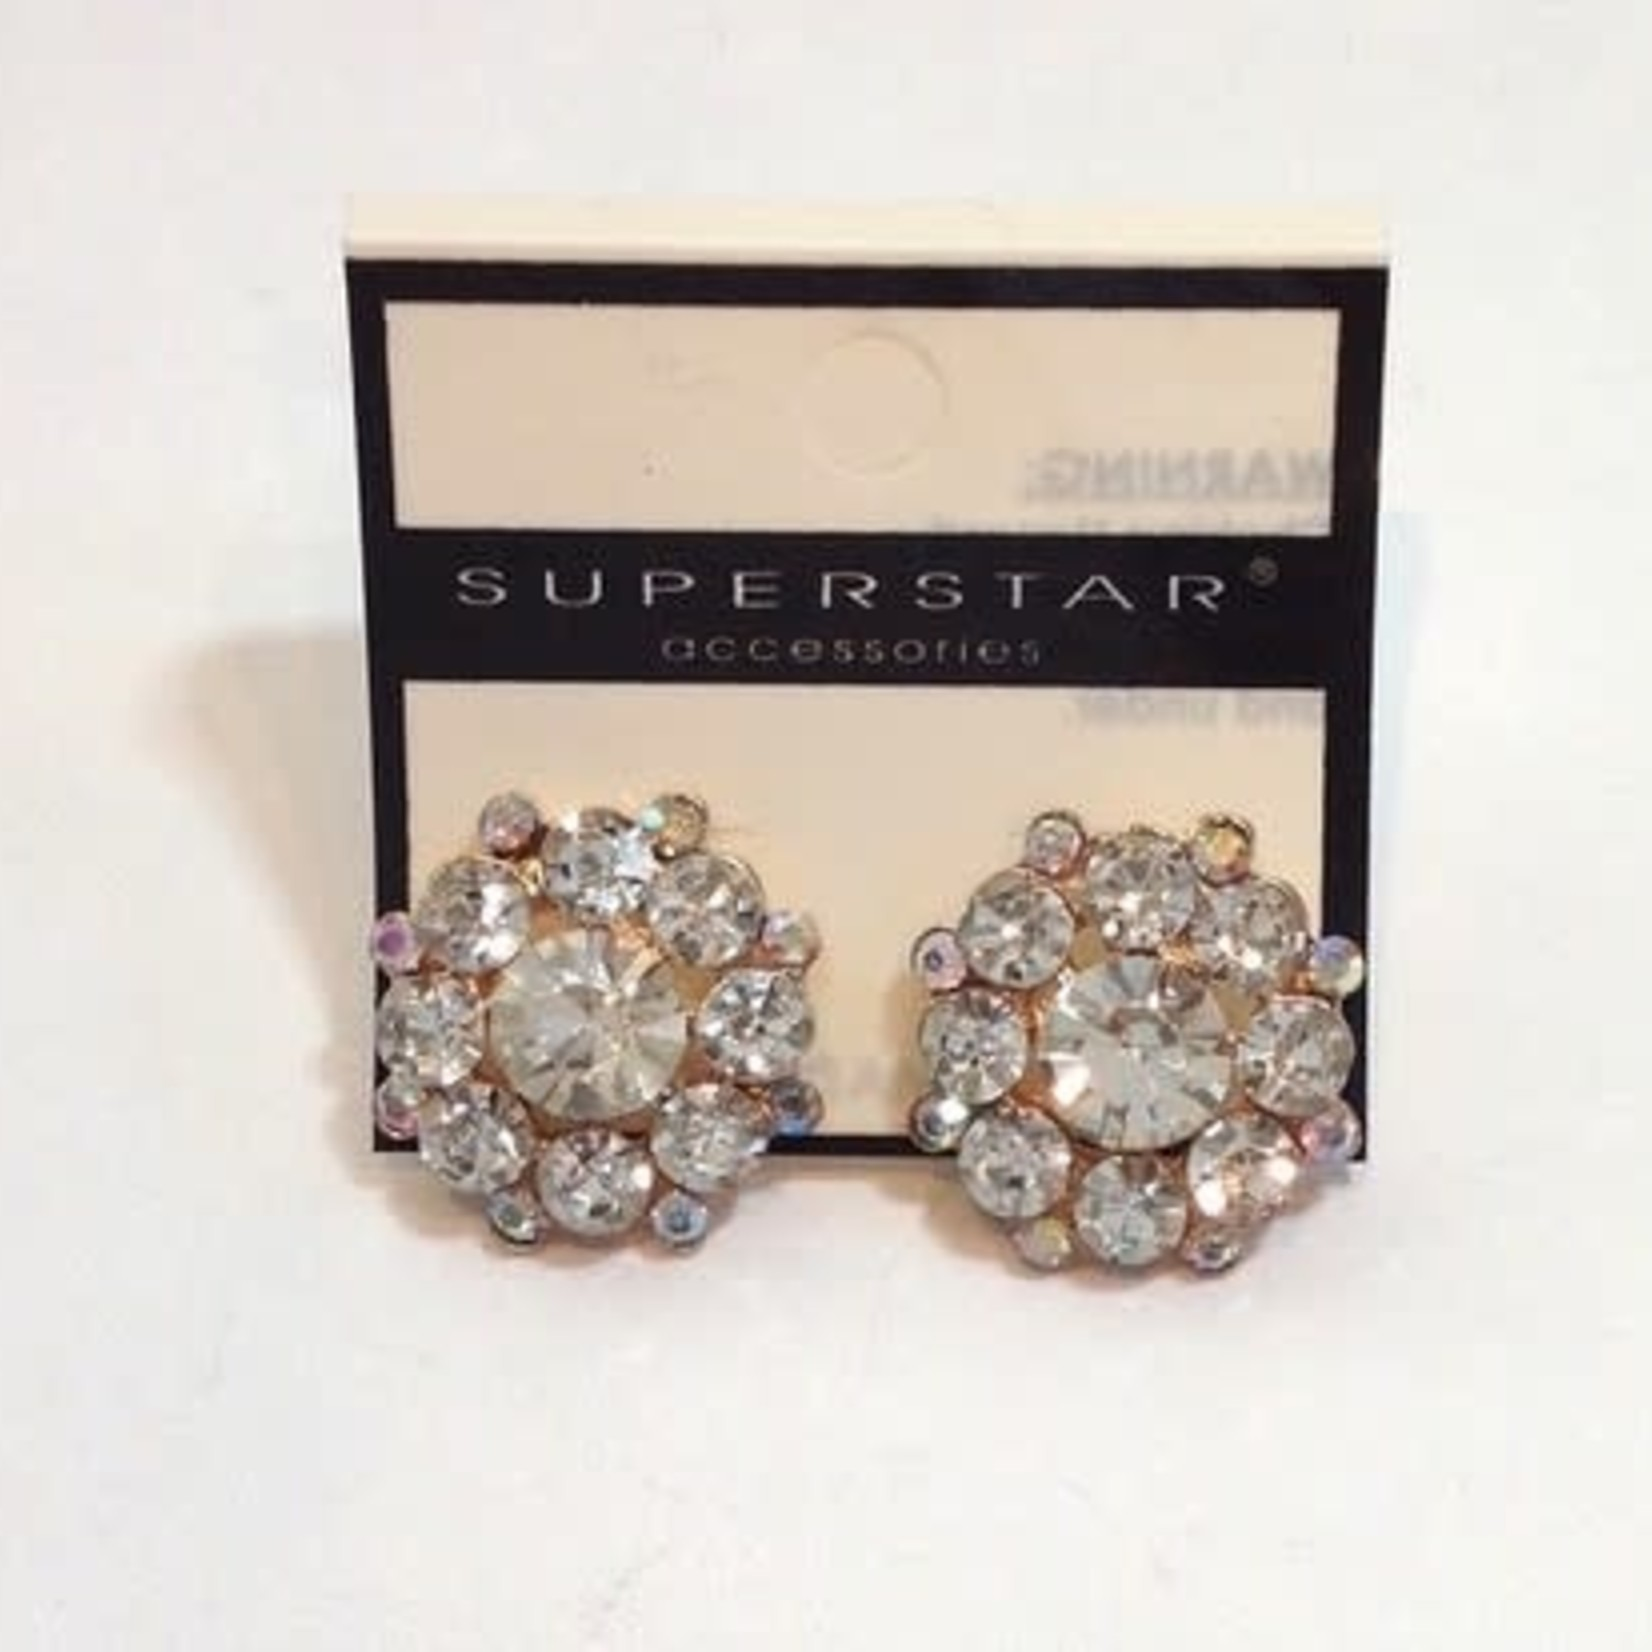 CJ Merchantile CJ Merchantile RA262 Superstar Crystal Cluster Earrings 22mm